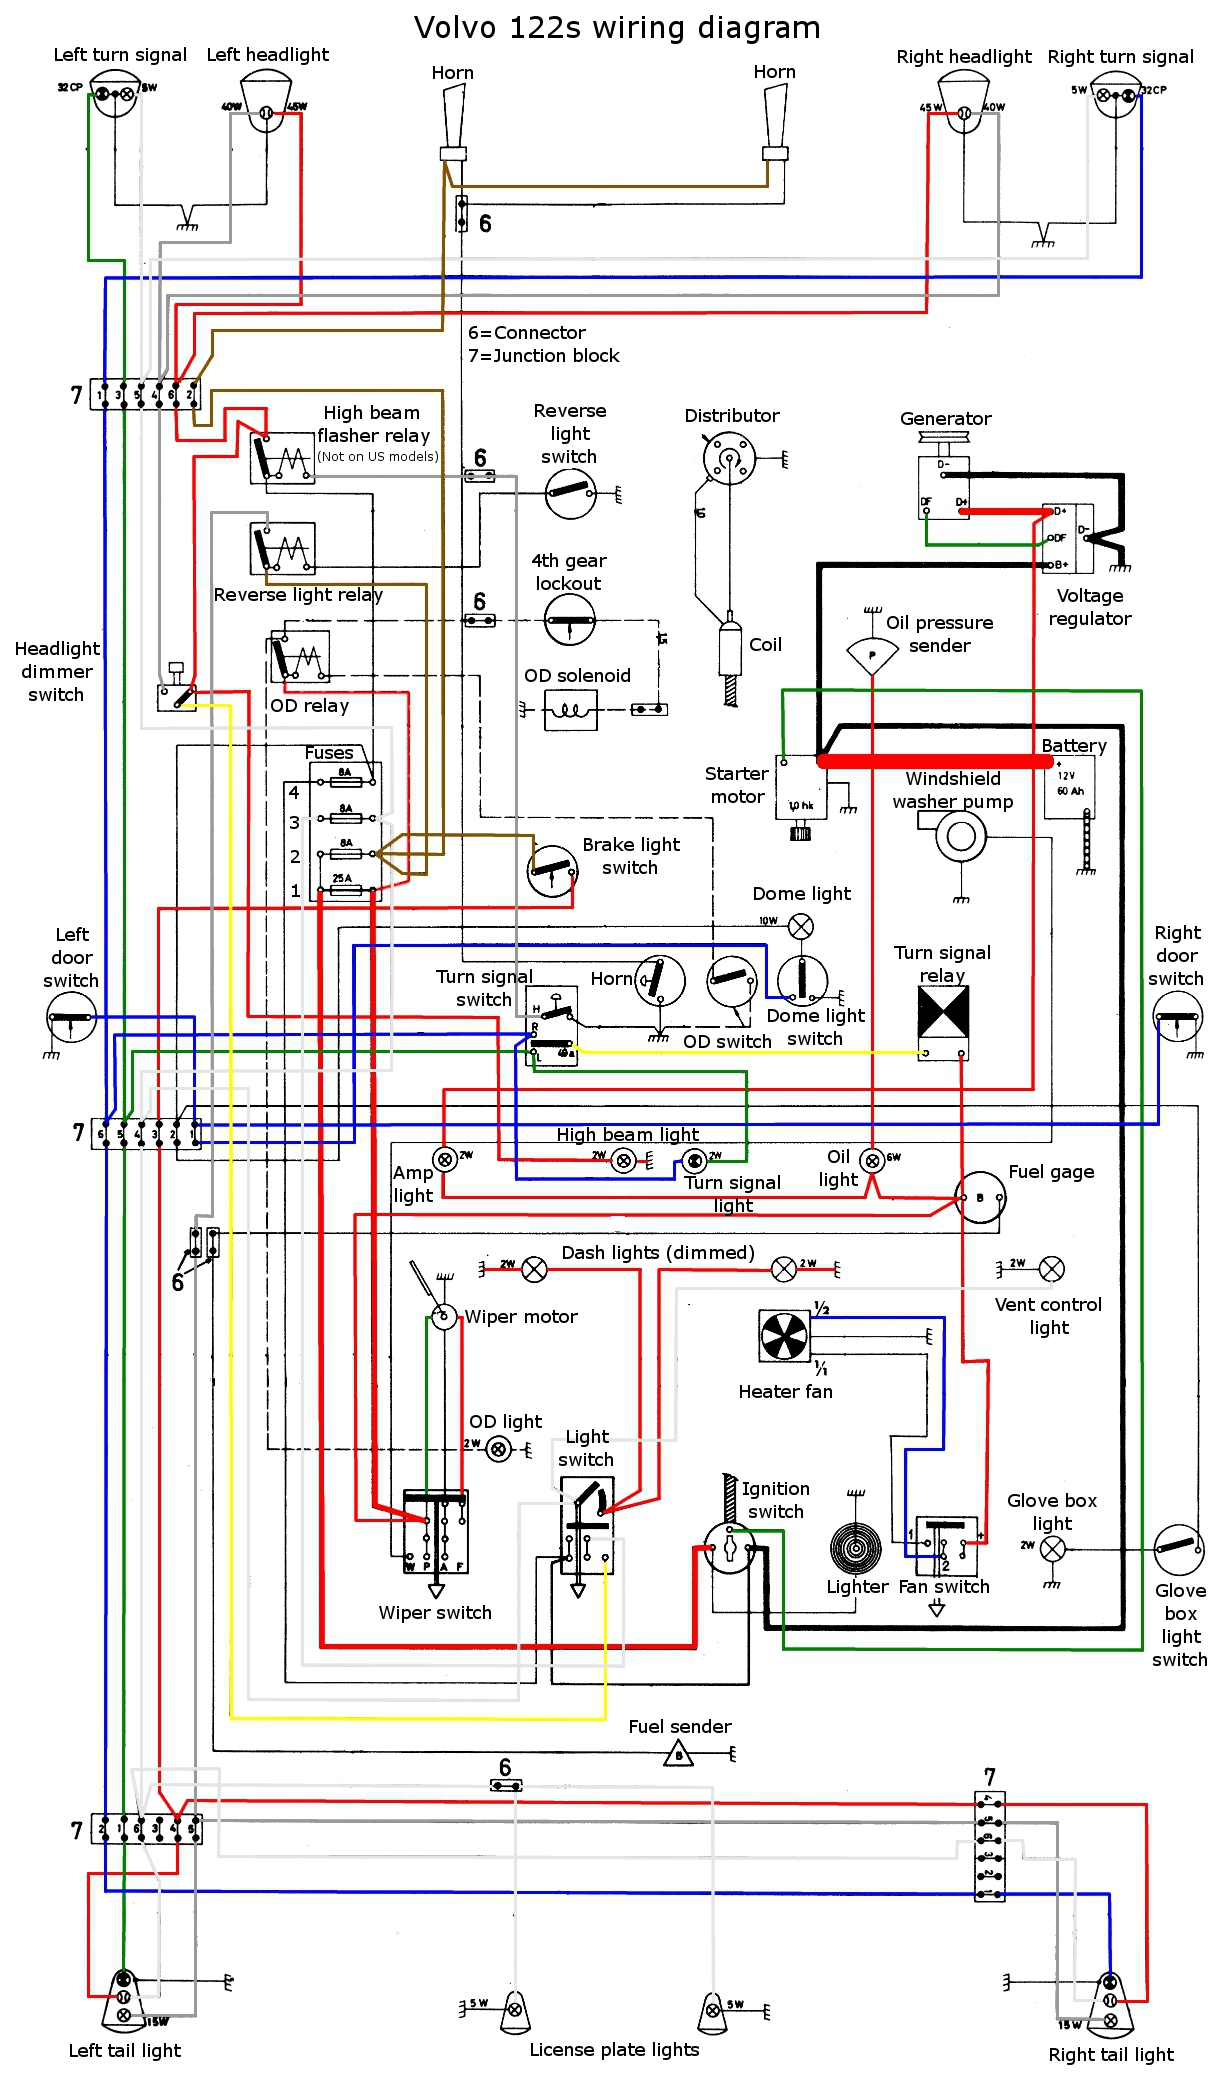 mk_4666] s80 t6 engine diagram schematic wiring  chim xortanet xolia ifica grebs sospe oupli over benkeme rine umize ponge  mohammedshrine librar wiring 101